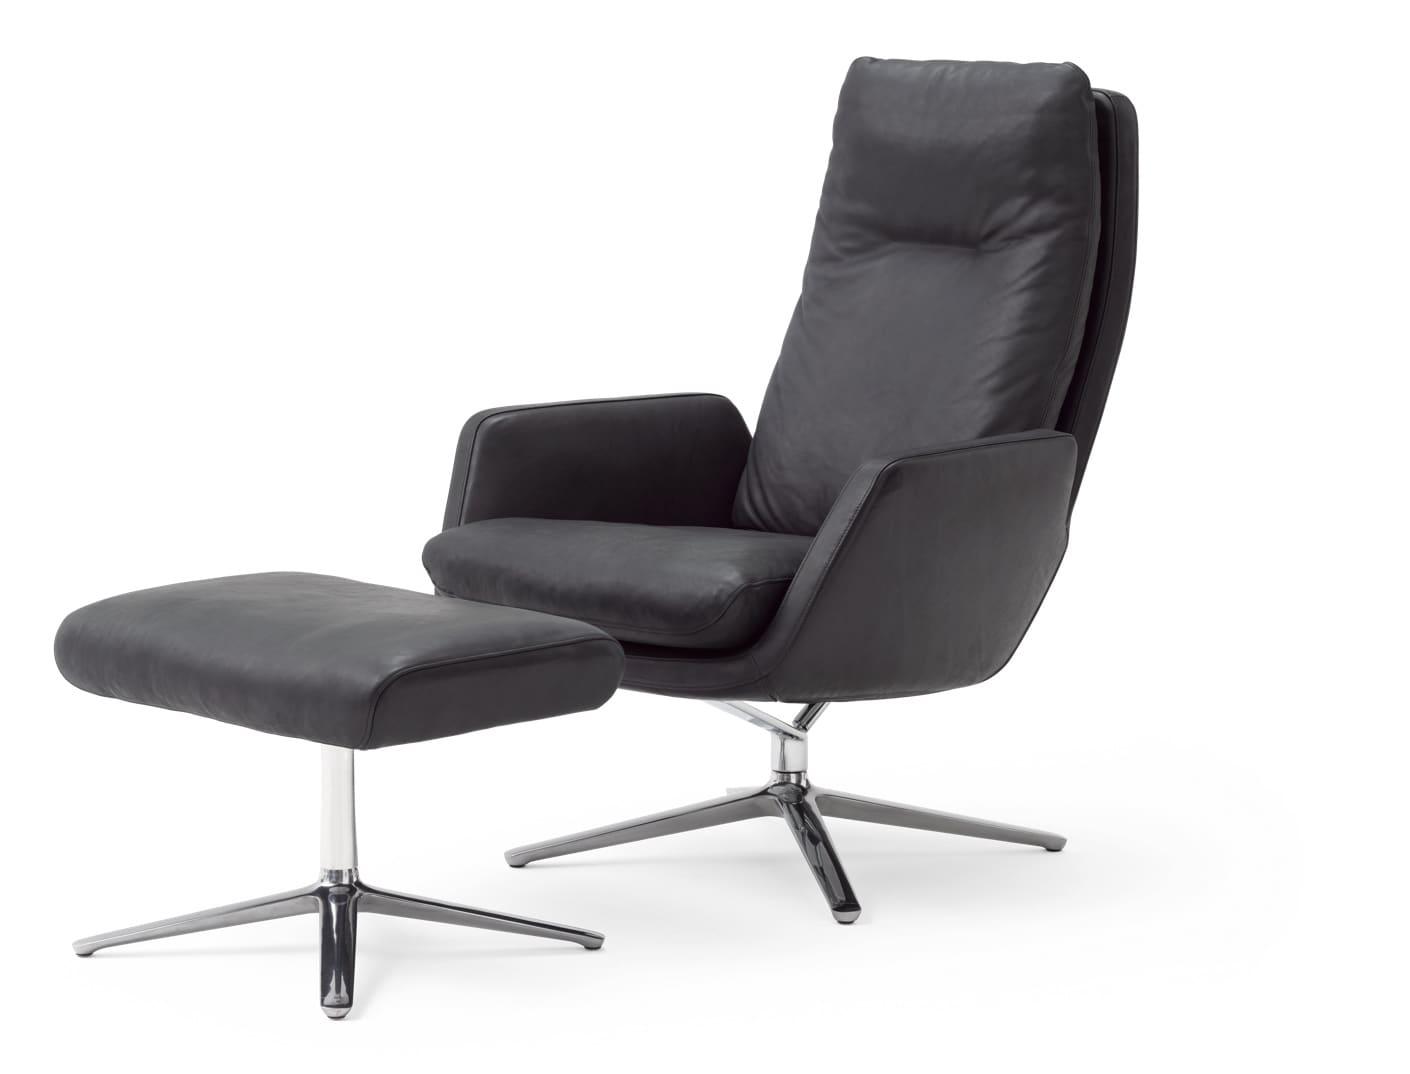 Cordia Lounge Sessel Neu Eingetroffen